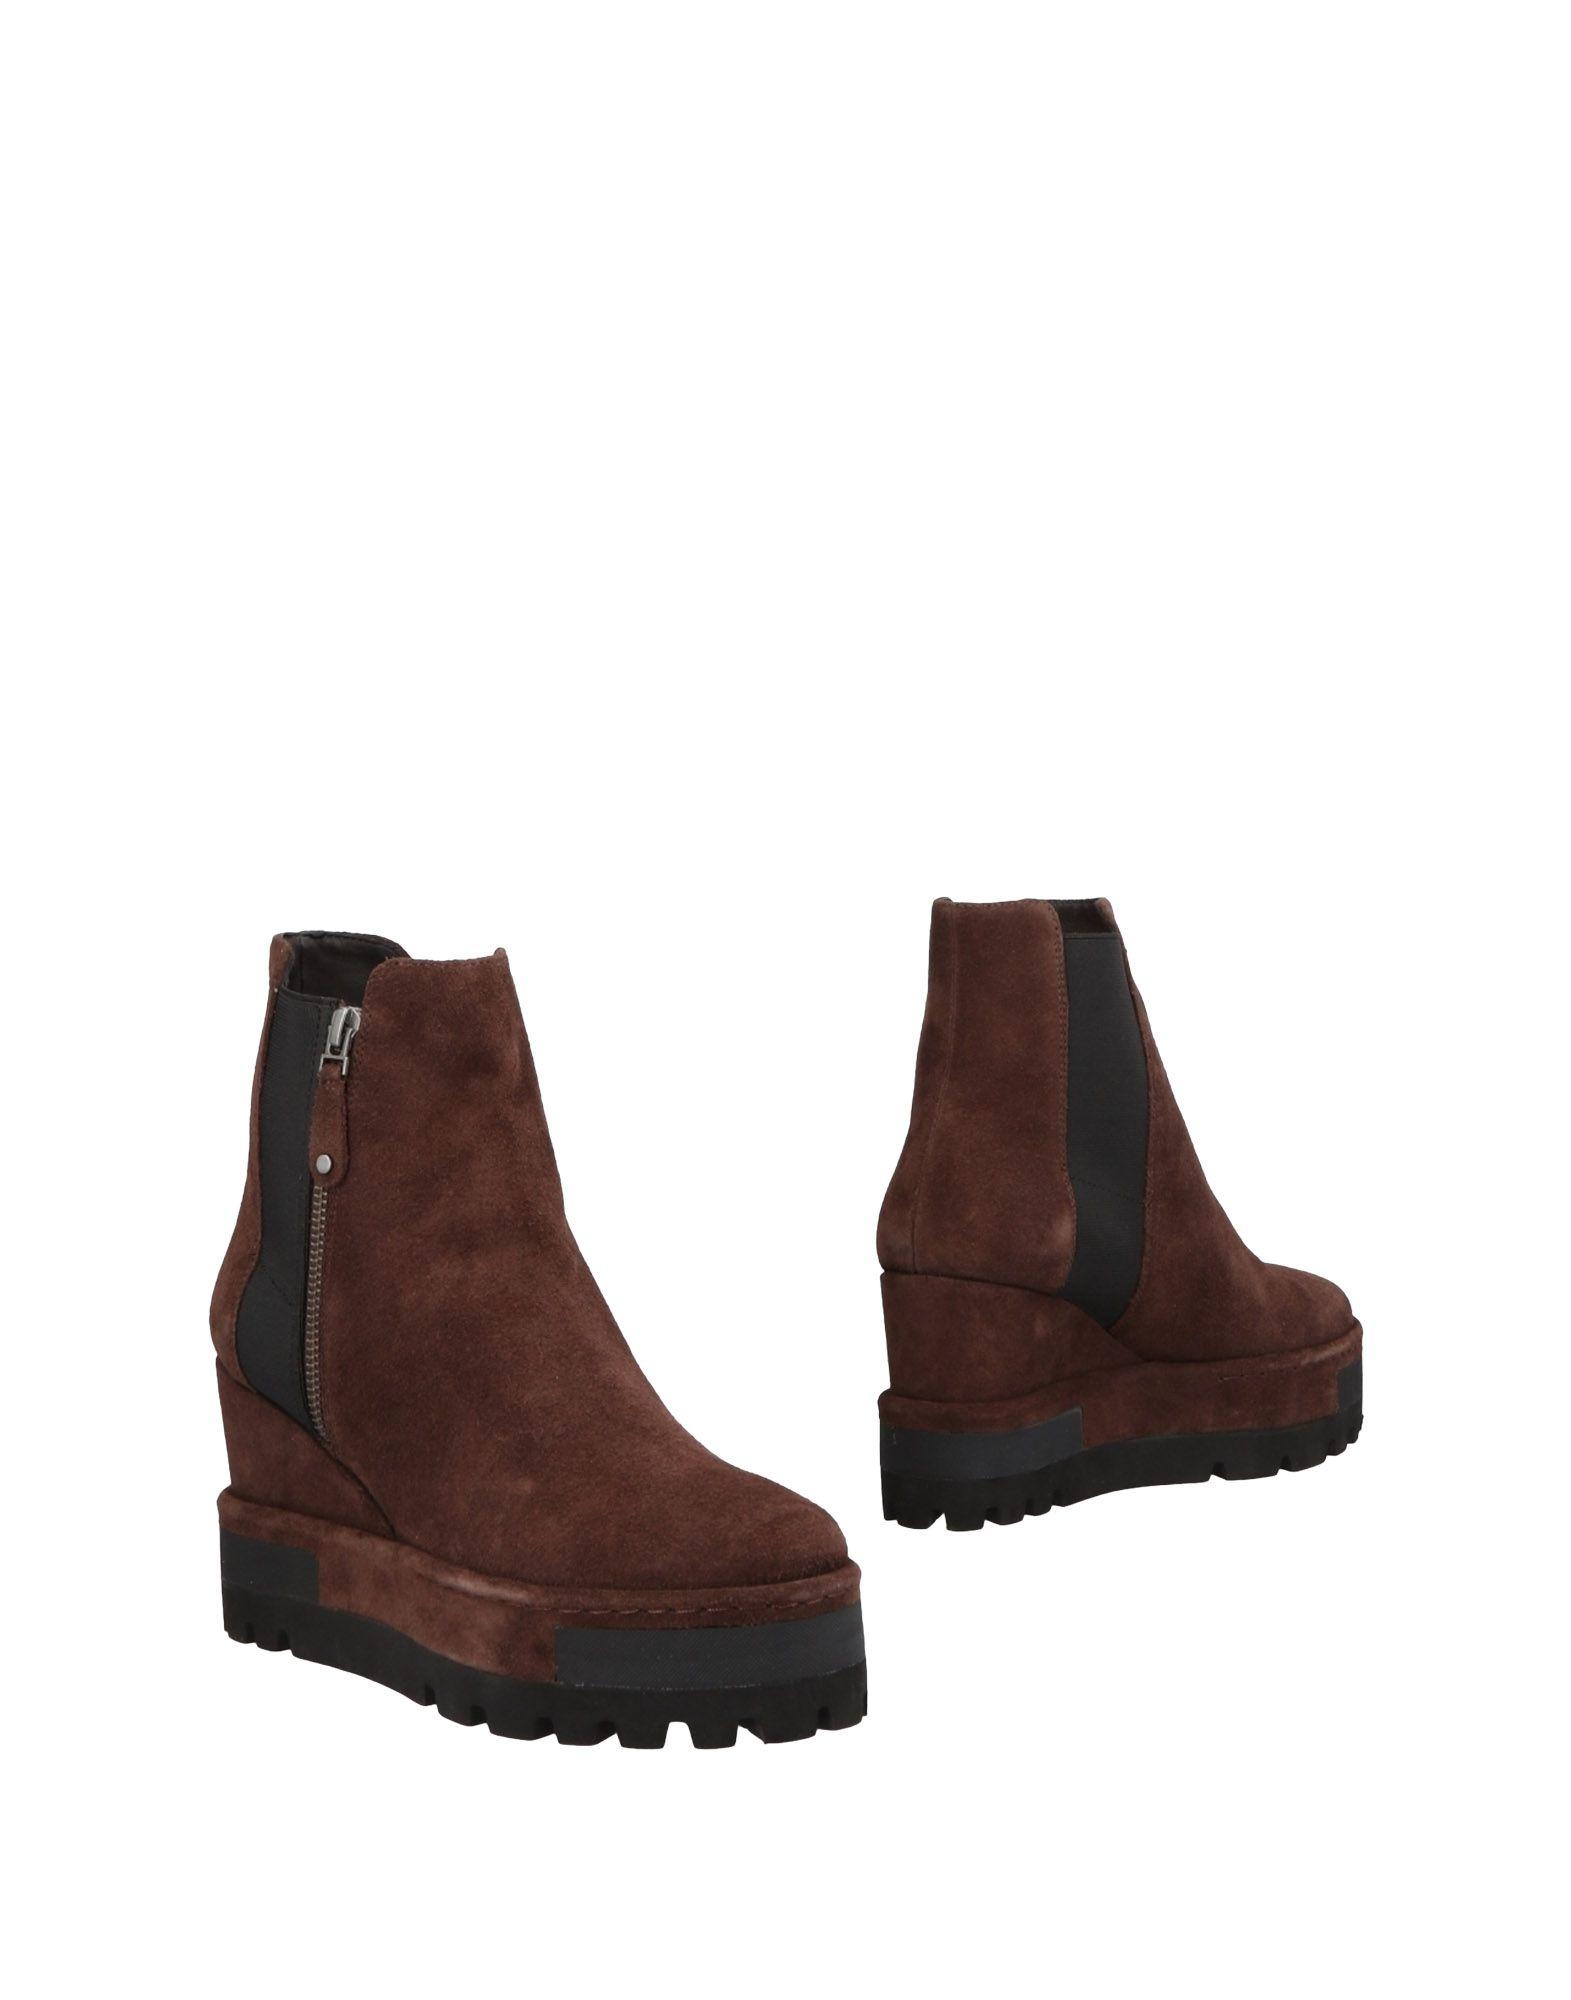 Elvio Zanon Ankle Boot - Women Elvio on Zanon Ankle Boots online on Elvio  Australia - 11494456CR fc8694